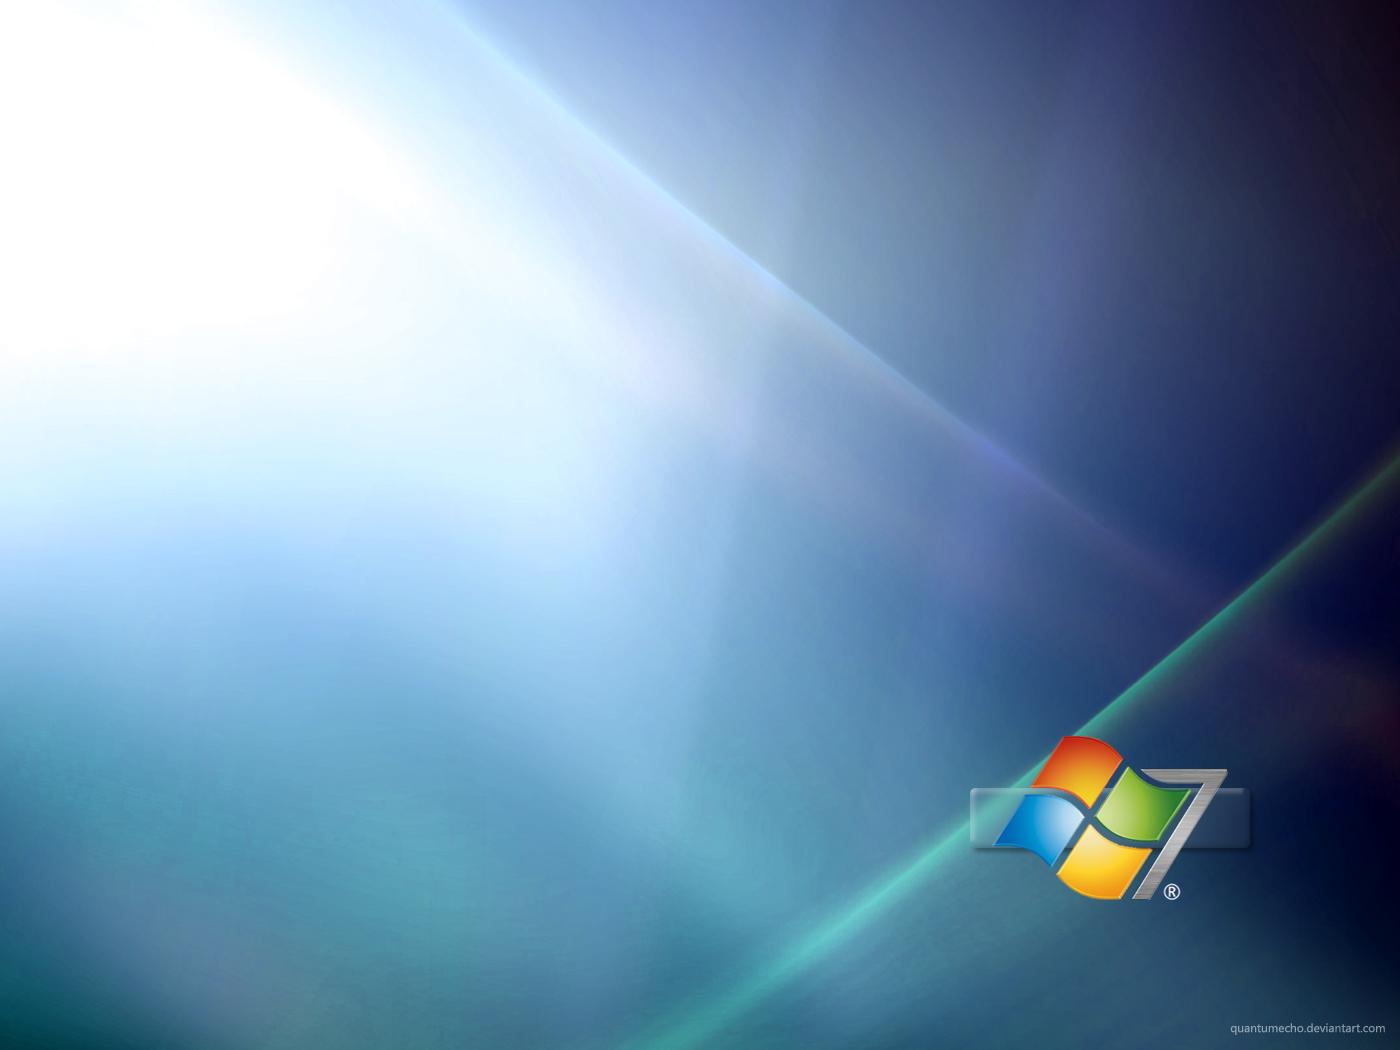 HQ Windows 7 Ultimate 29 Wallpaper HQ Wallpapers 1400x1050